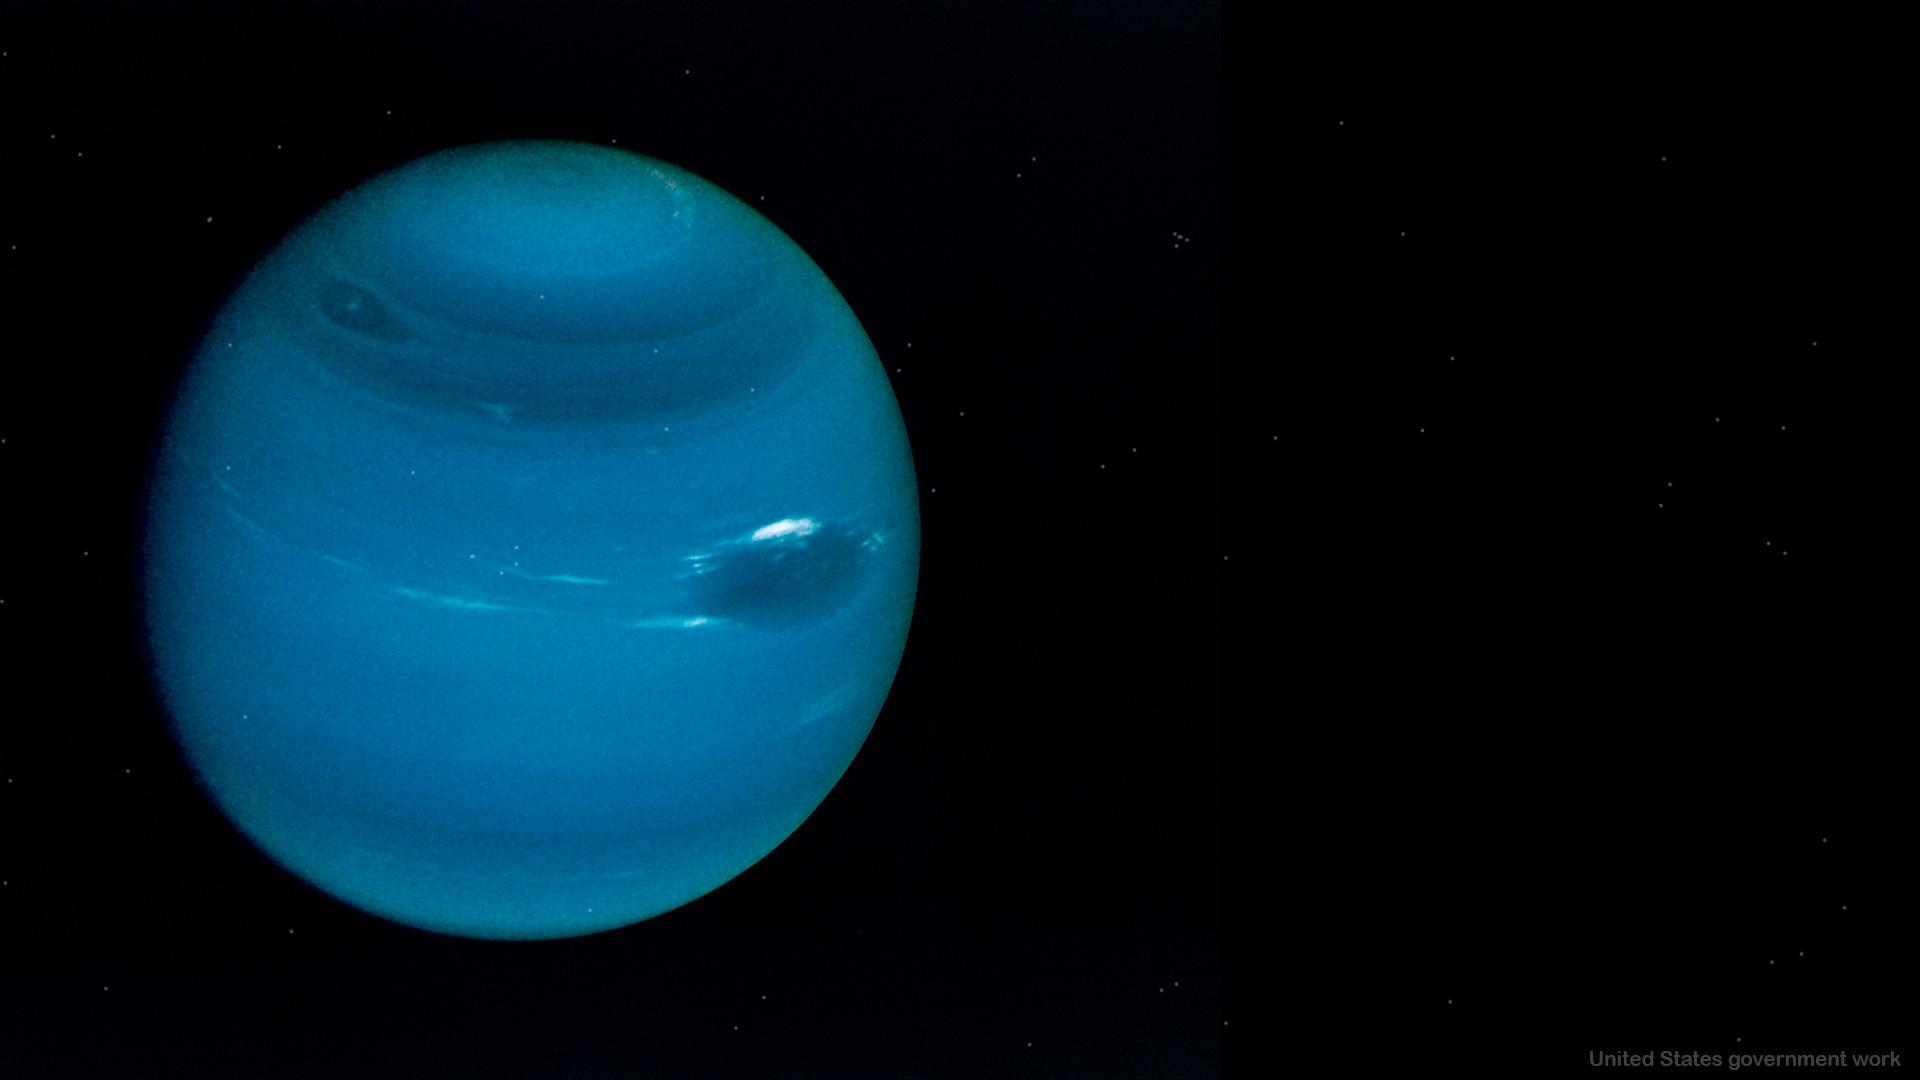 Blue Neptune on Black Background